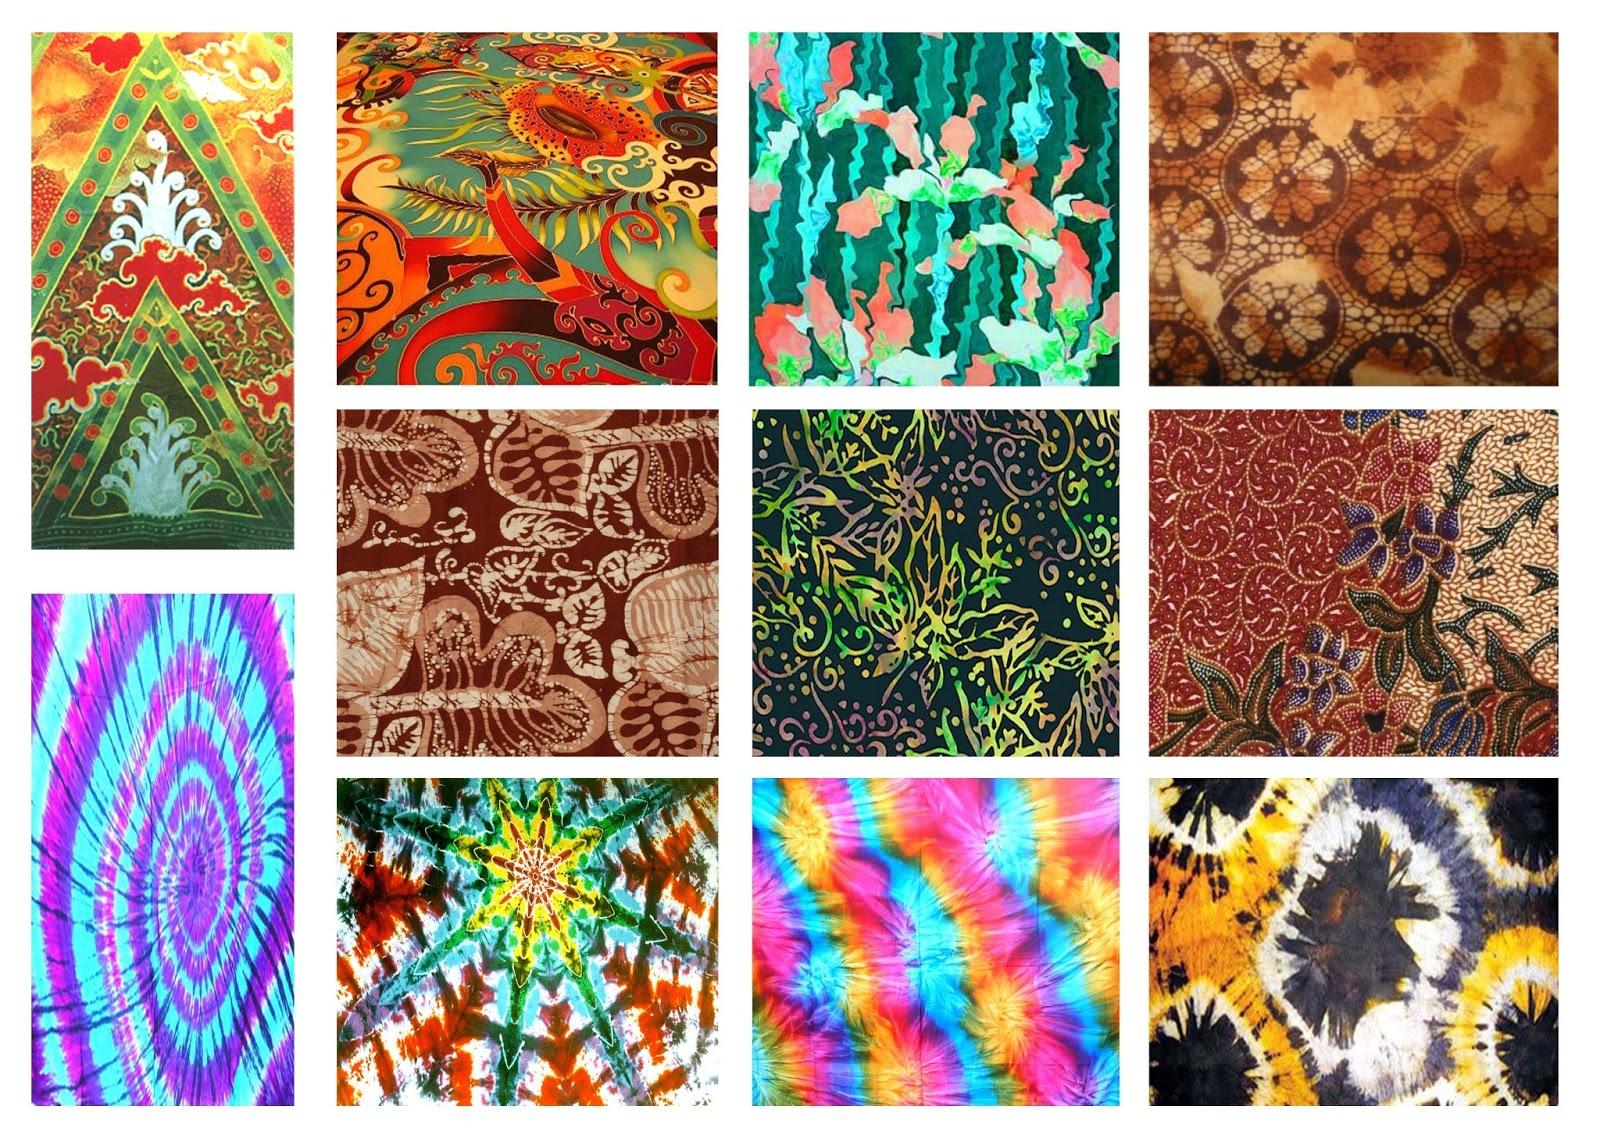 Koleksi pelbagai corak batik sebagai sumber ilham.